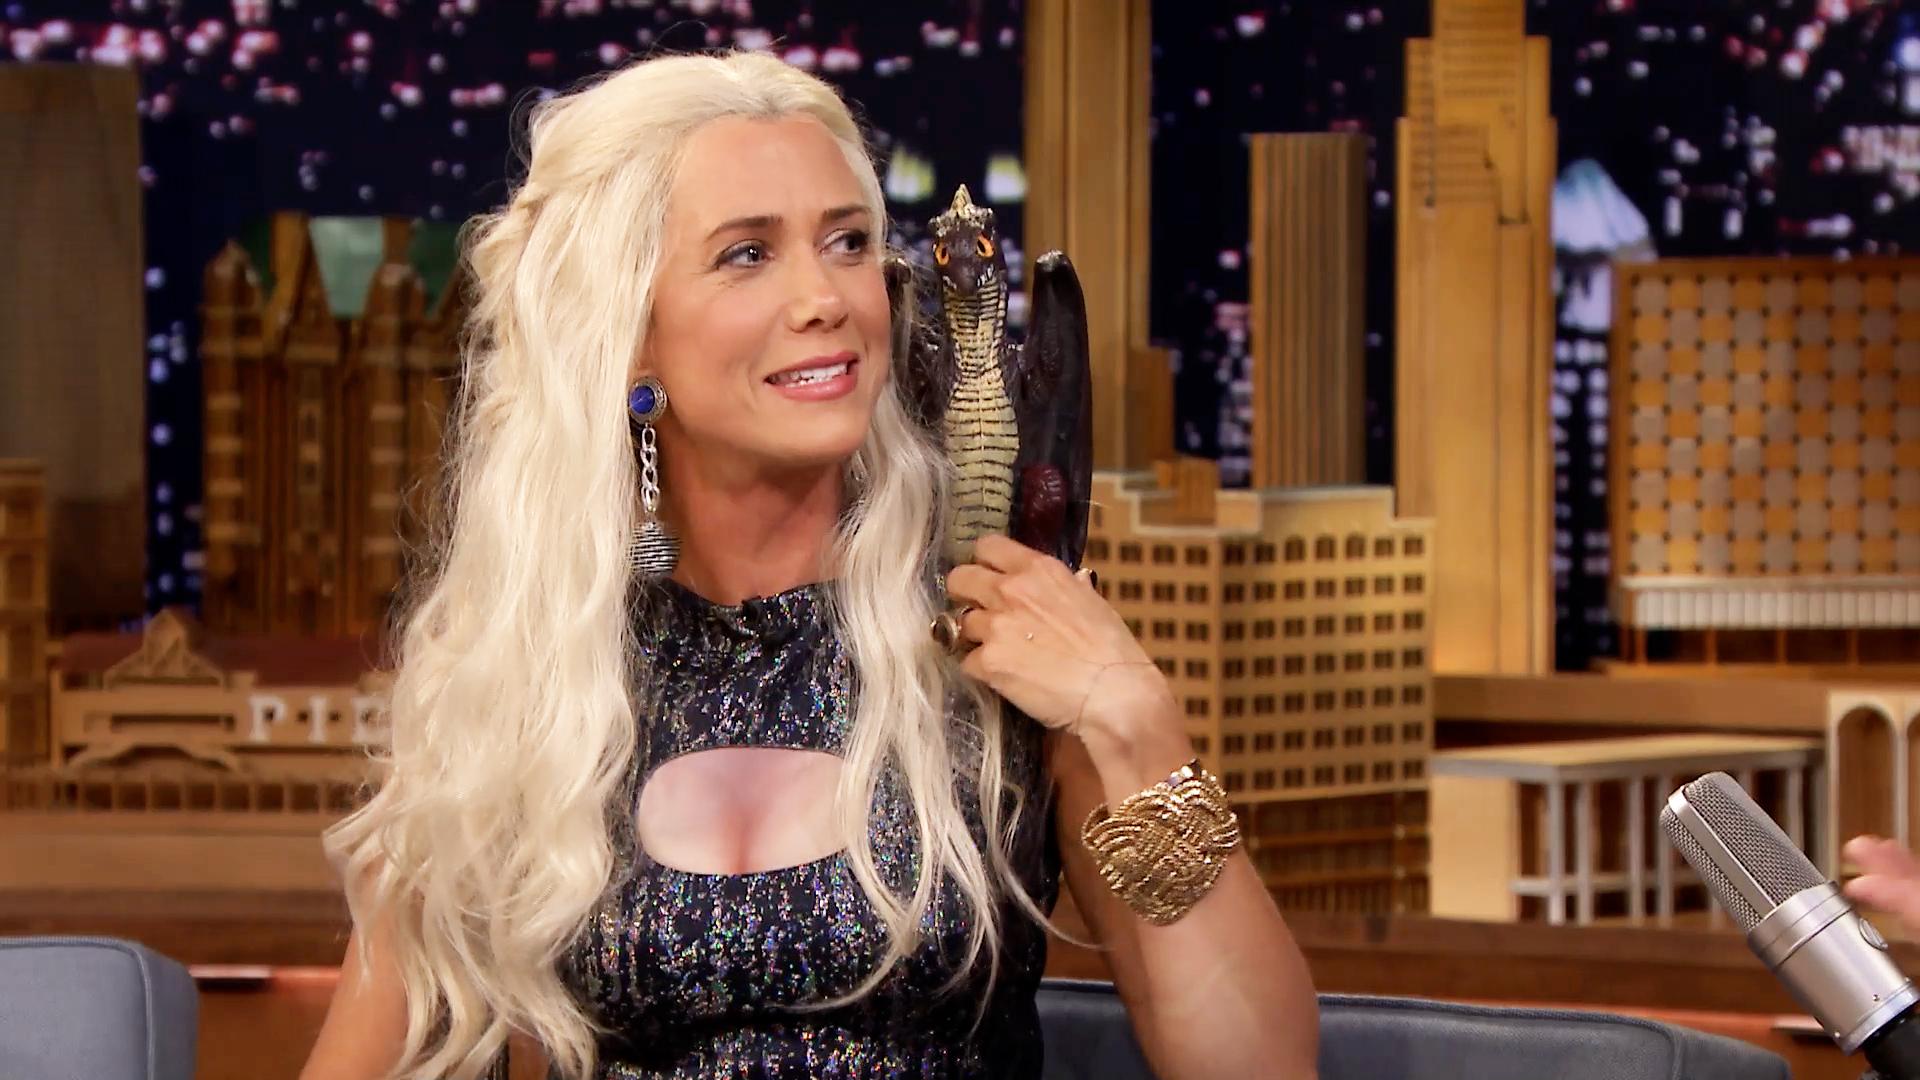 Jimmy Interviews Khaleesi from Game of Thrones (Kristen ...: https://www.nbc.com/the-tonight-show/video/jimmy-interviews-khaleesi-from-game-of-thrones-kristen-wiig/2862814